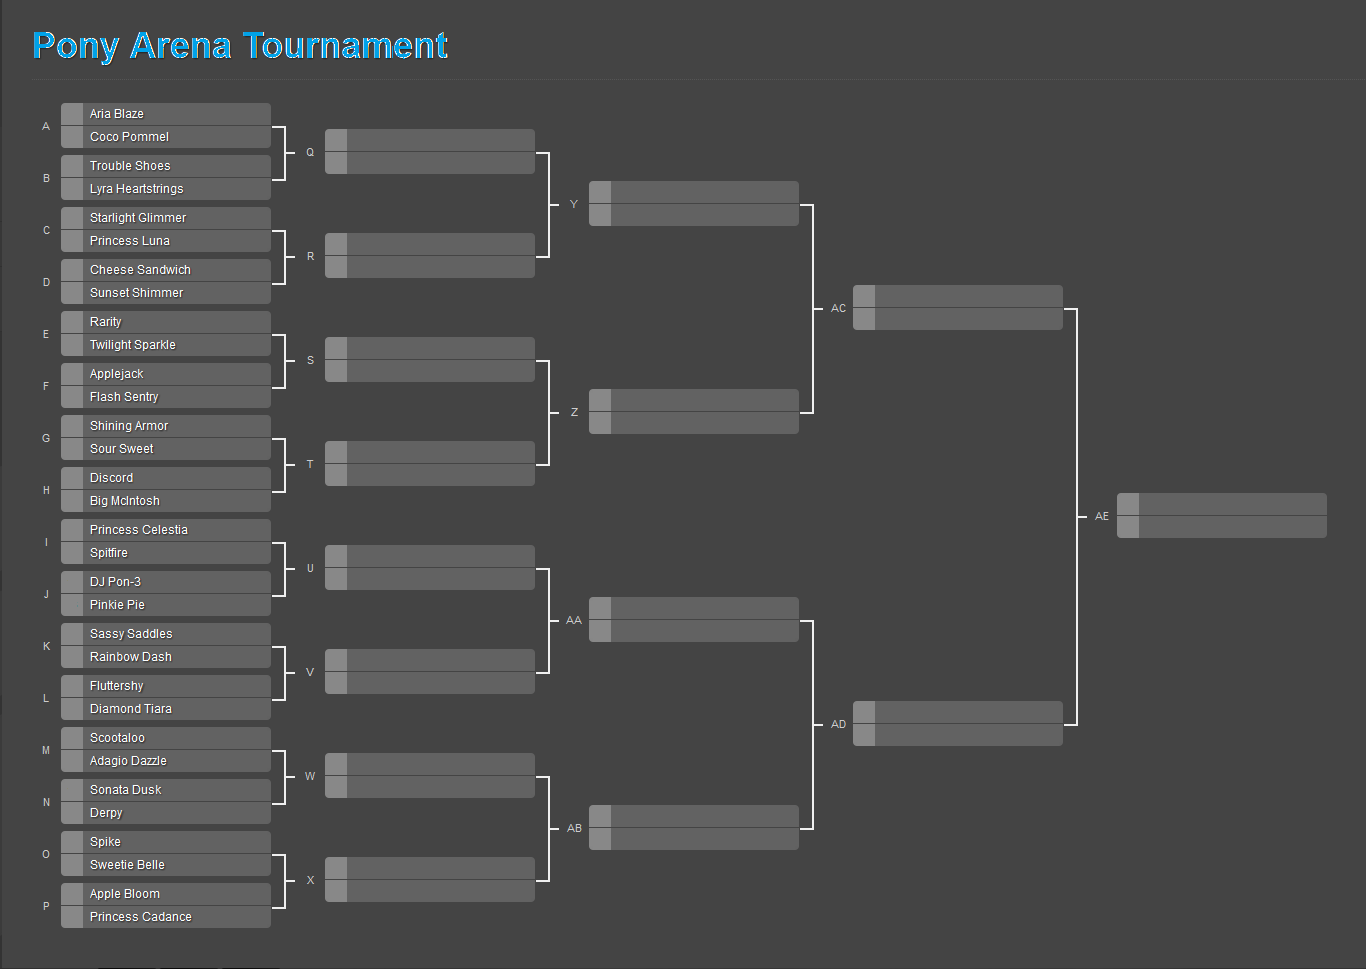 make your own tournament bracket